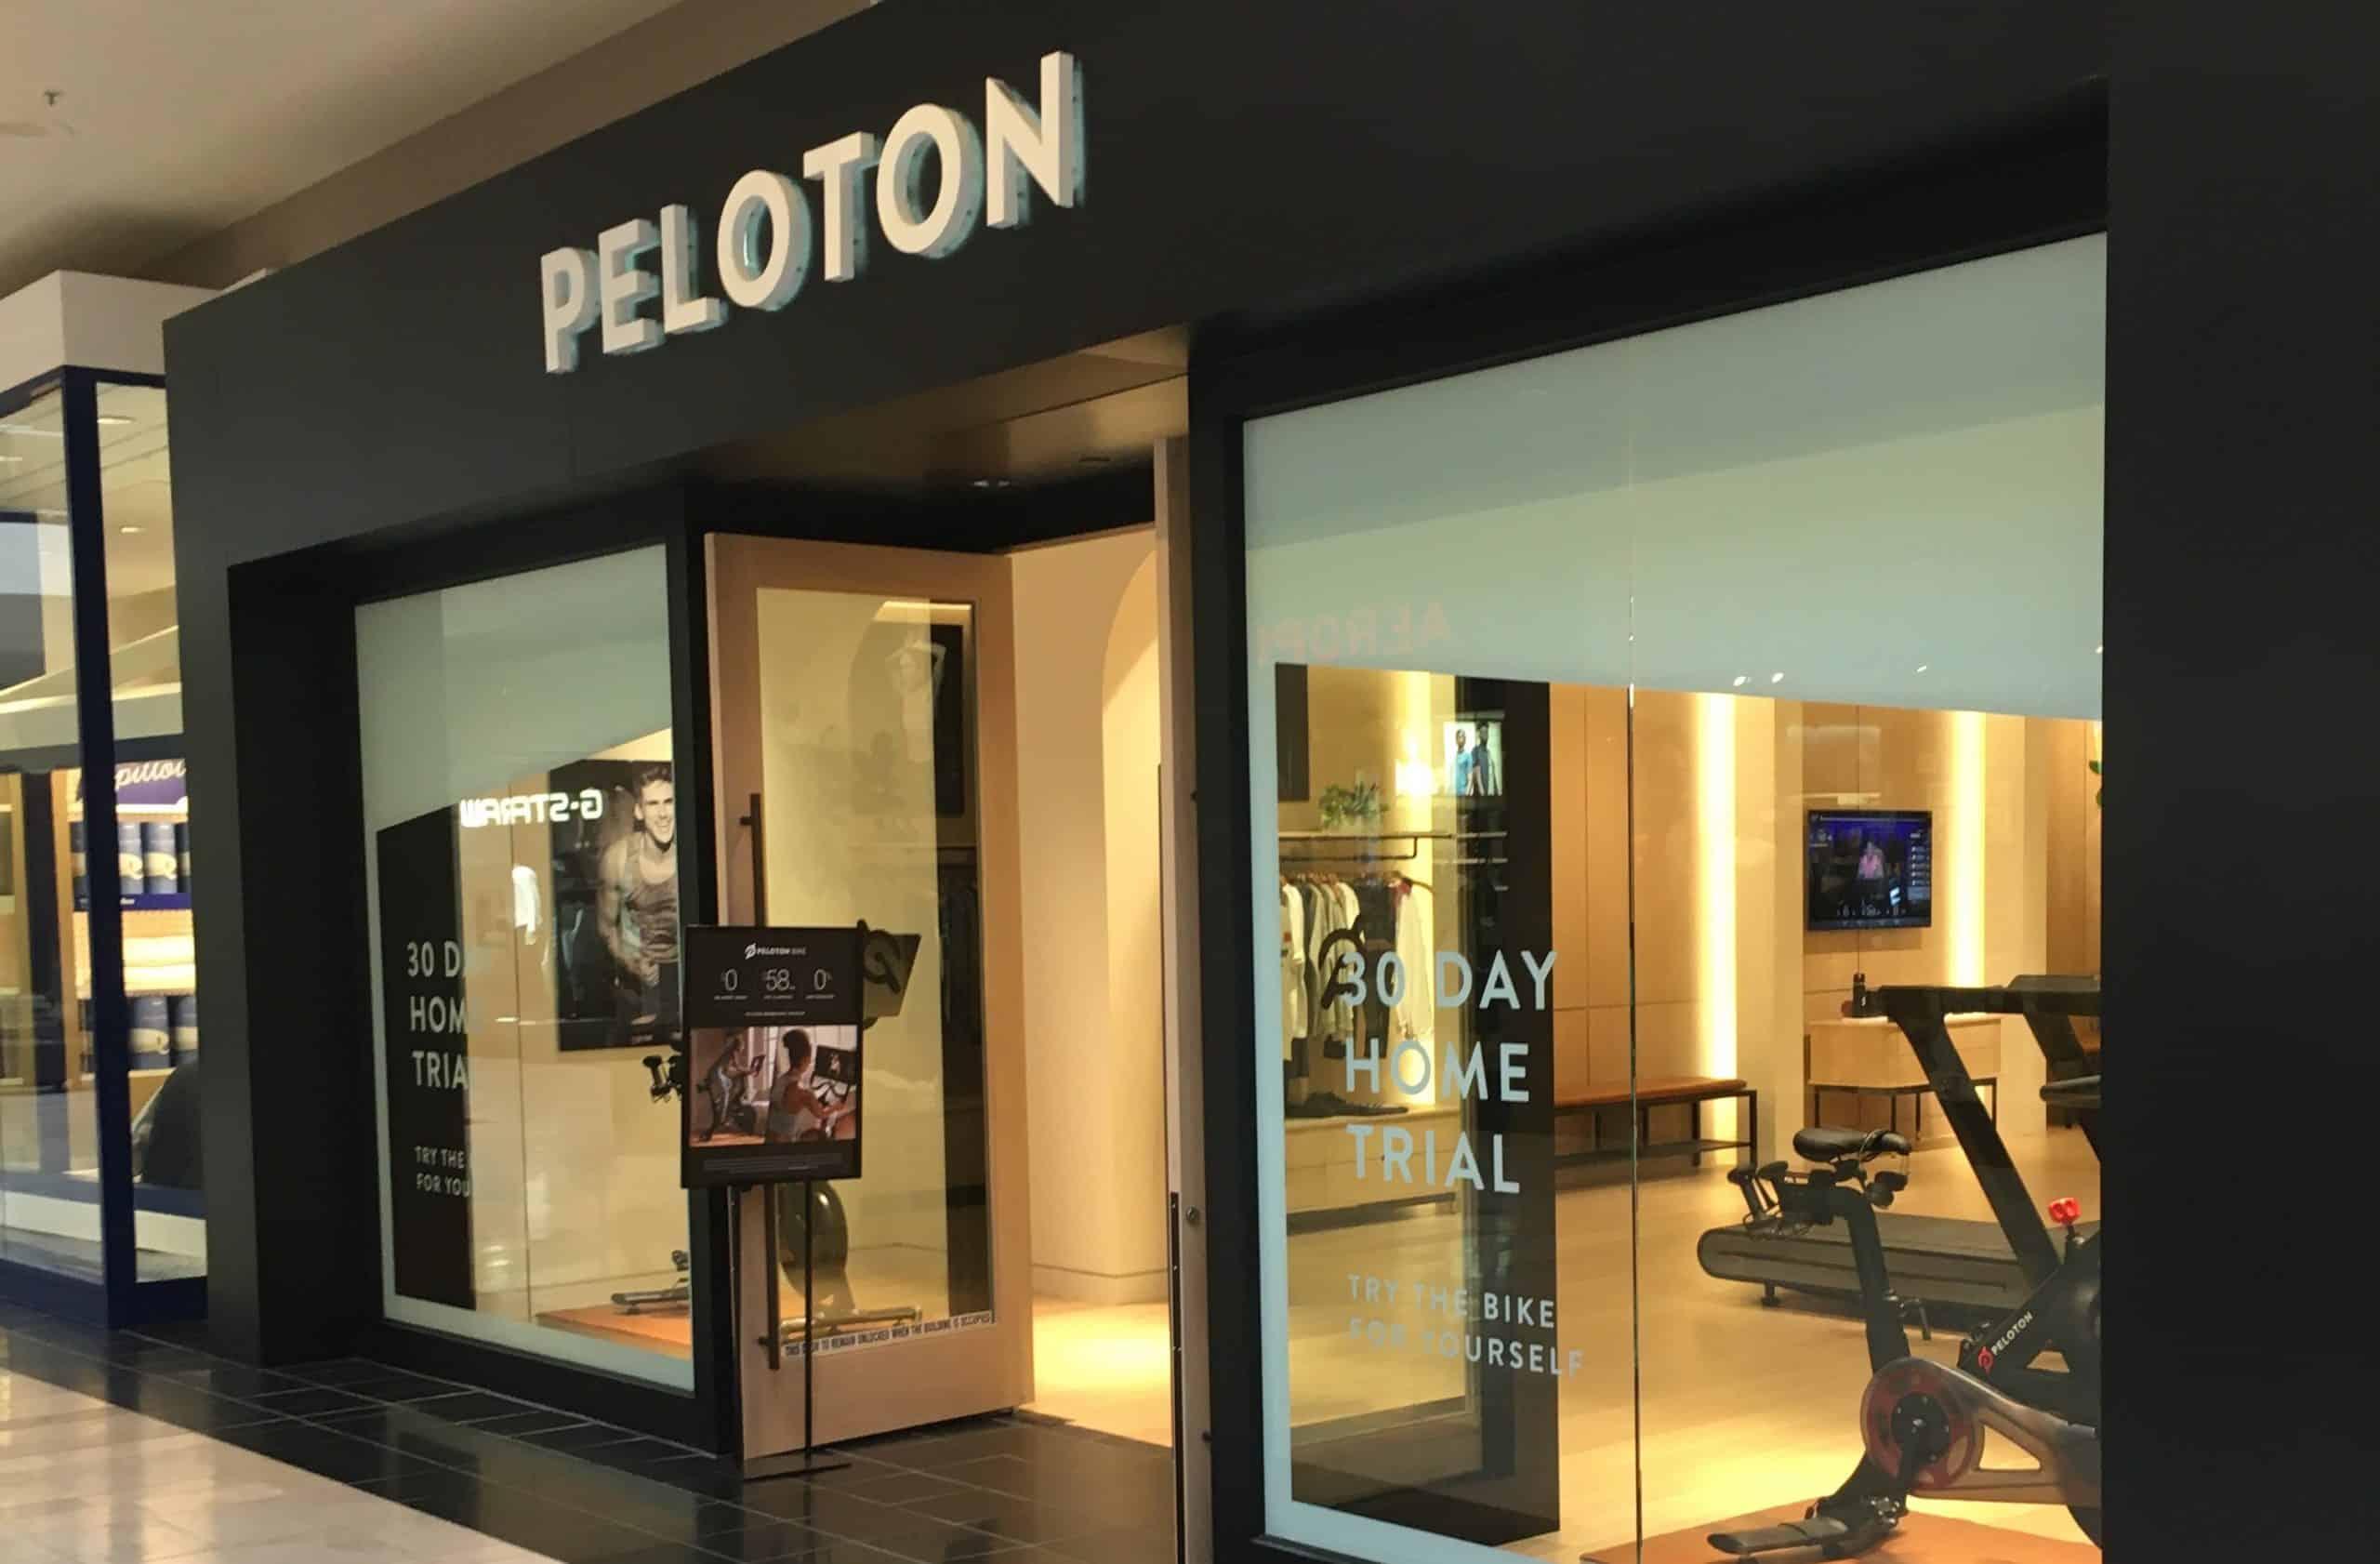 peloton free classes